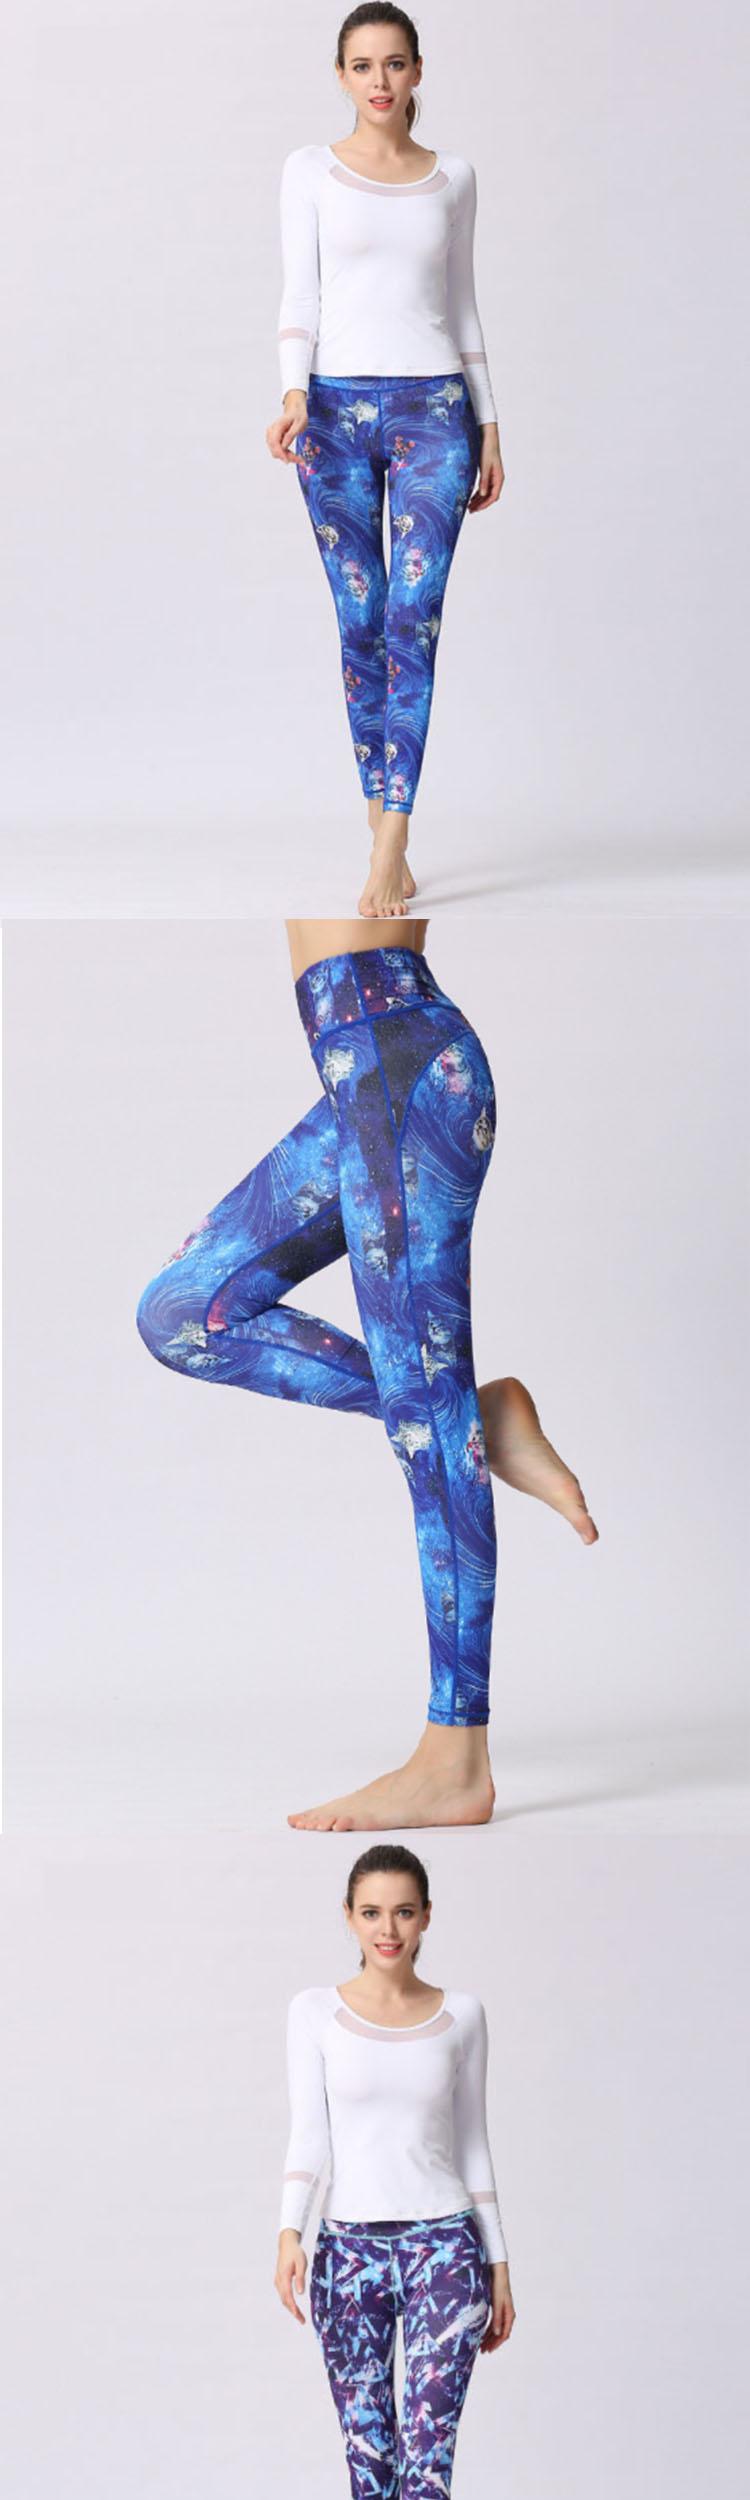 High waist stitching design, comfortable and thin.